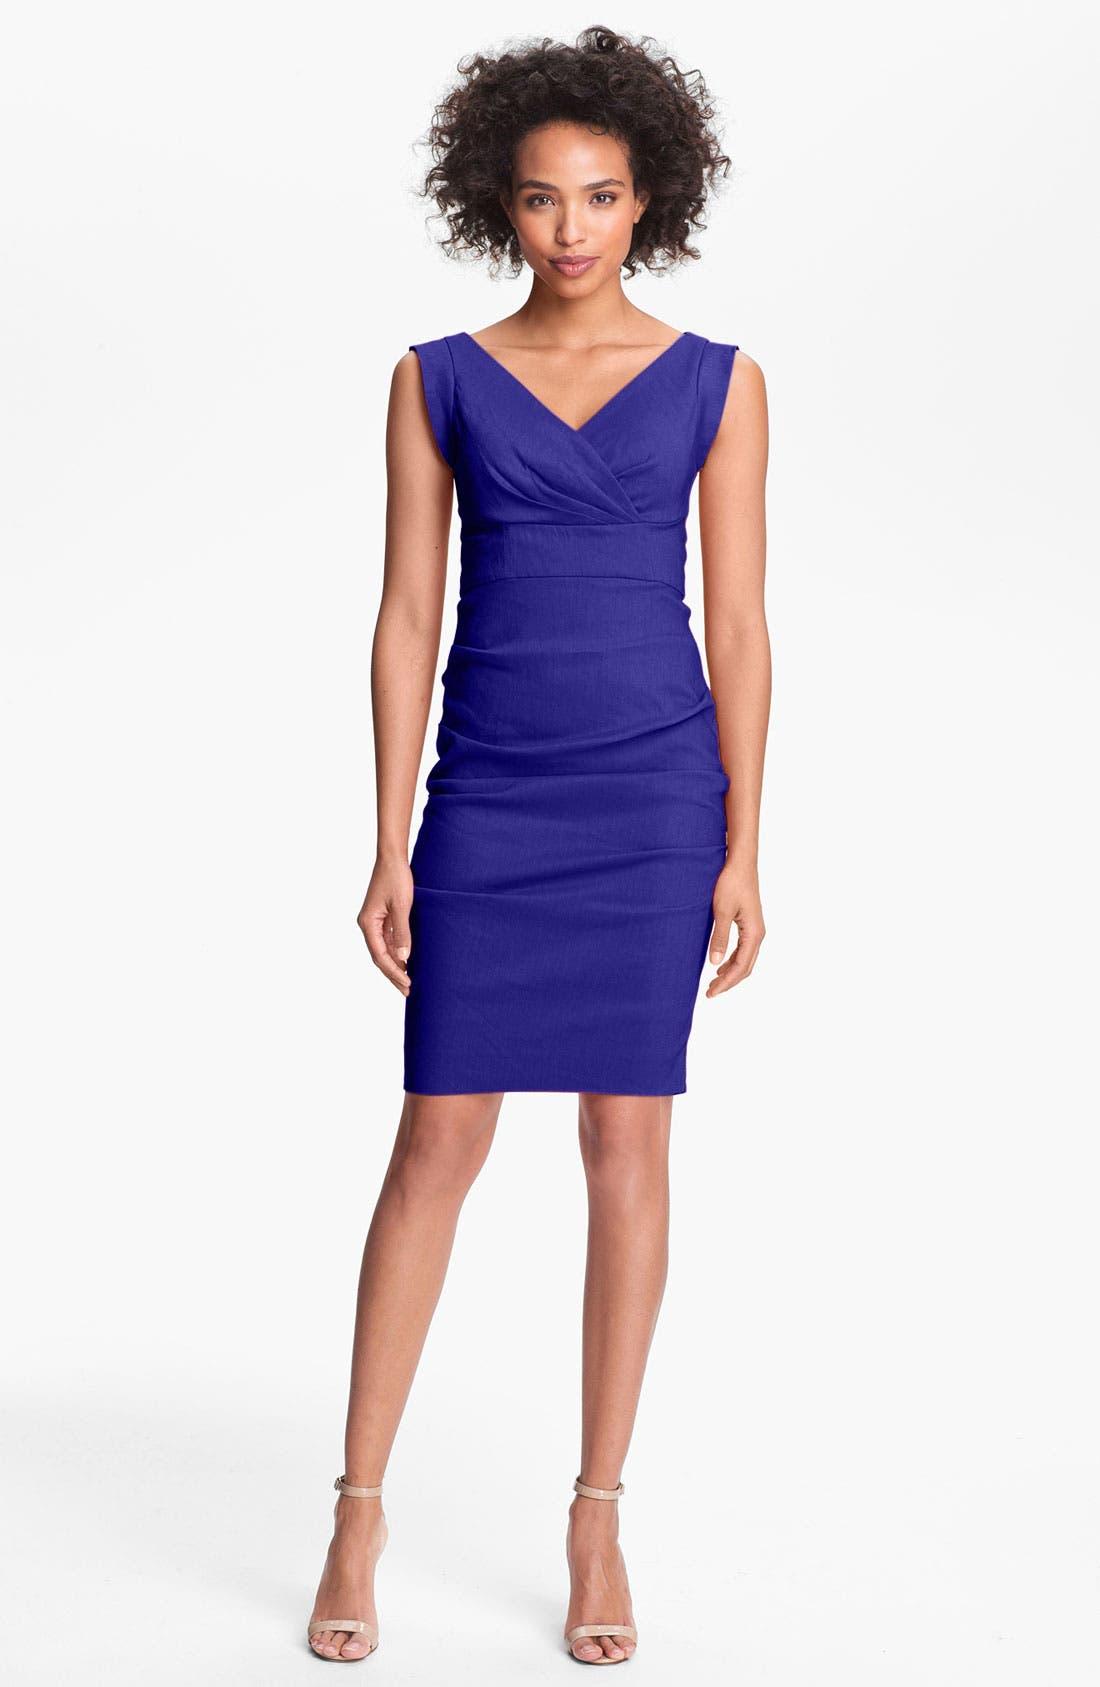 Alternate Image 1 Selected - Nicole Miller Ruched Surplice Sheath Dress